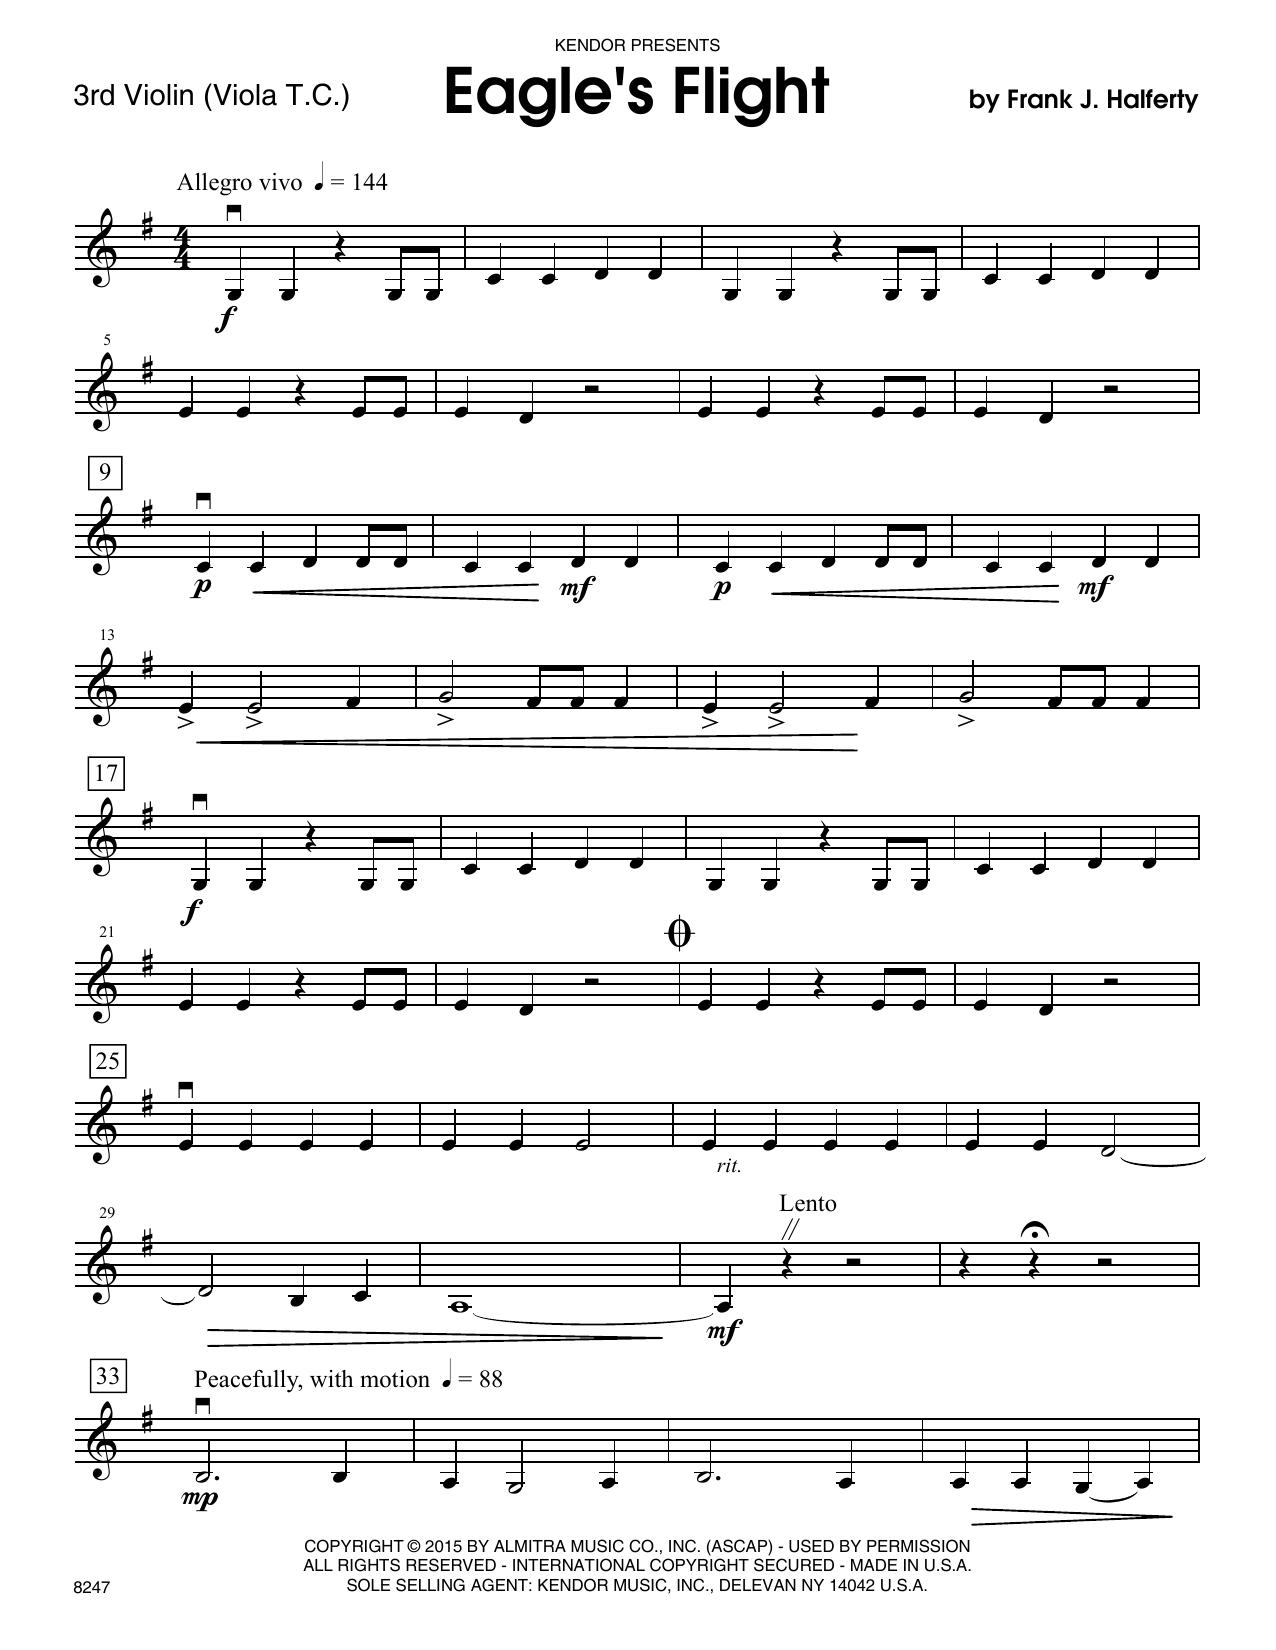 Eagle's Flight - Violin 3 (Viola T.C.) Sheet Music